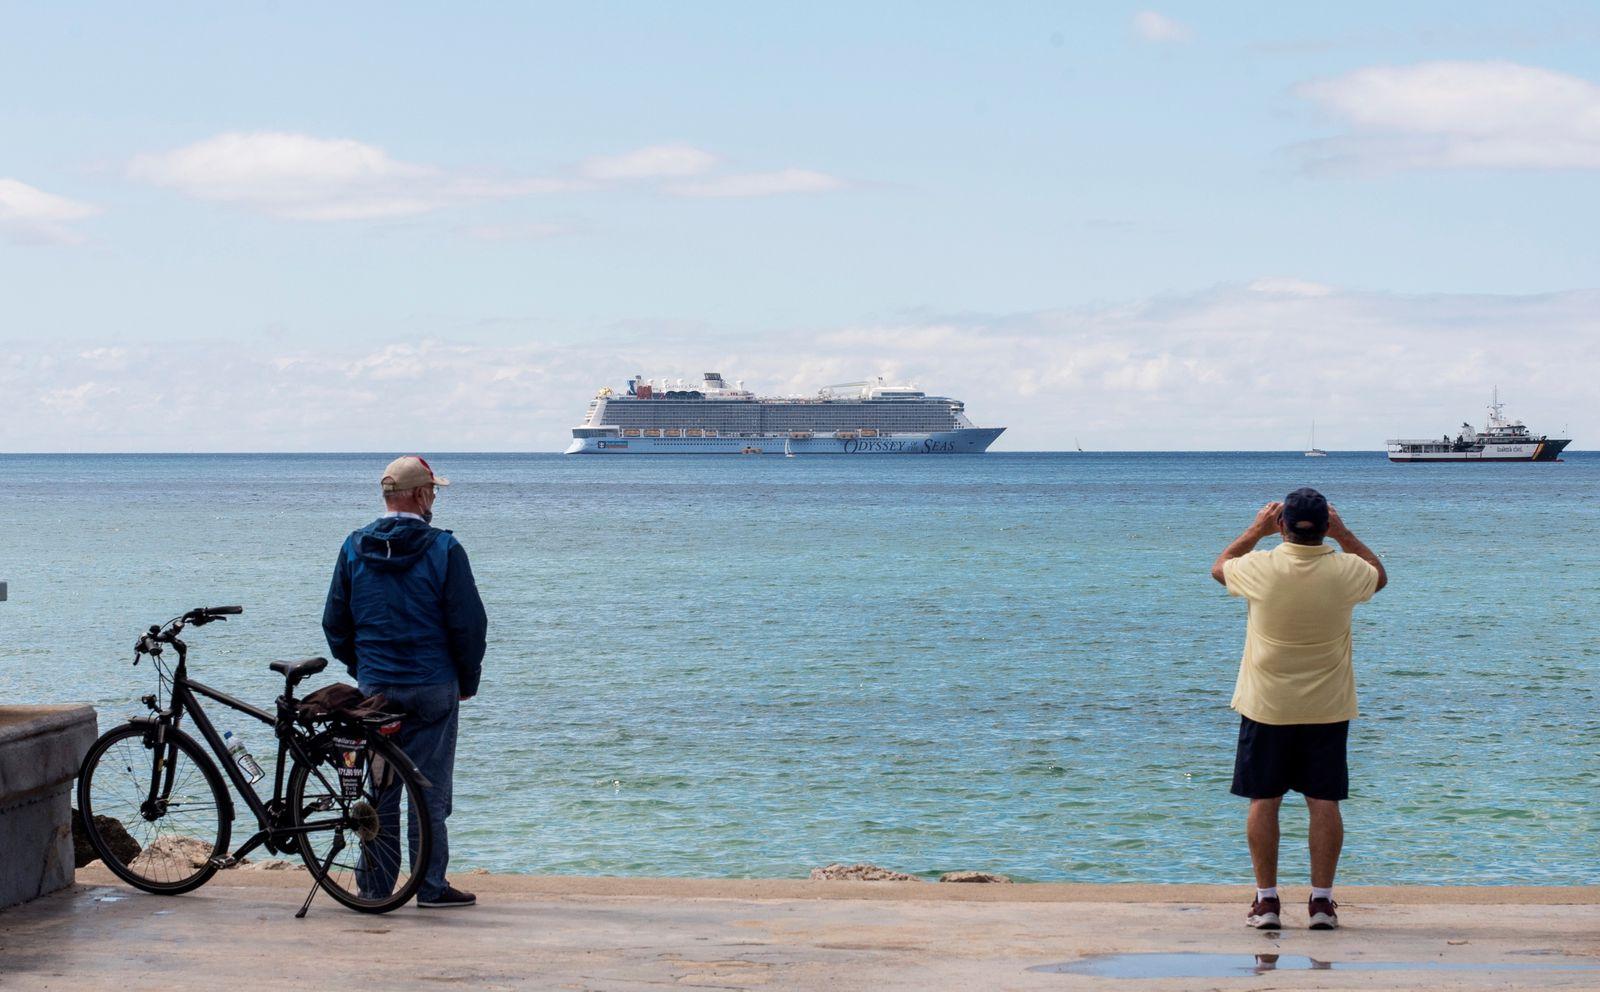 International cruise leaves crew members in Palma de Majorca after testing positive in coronavirus